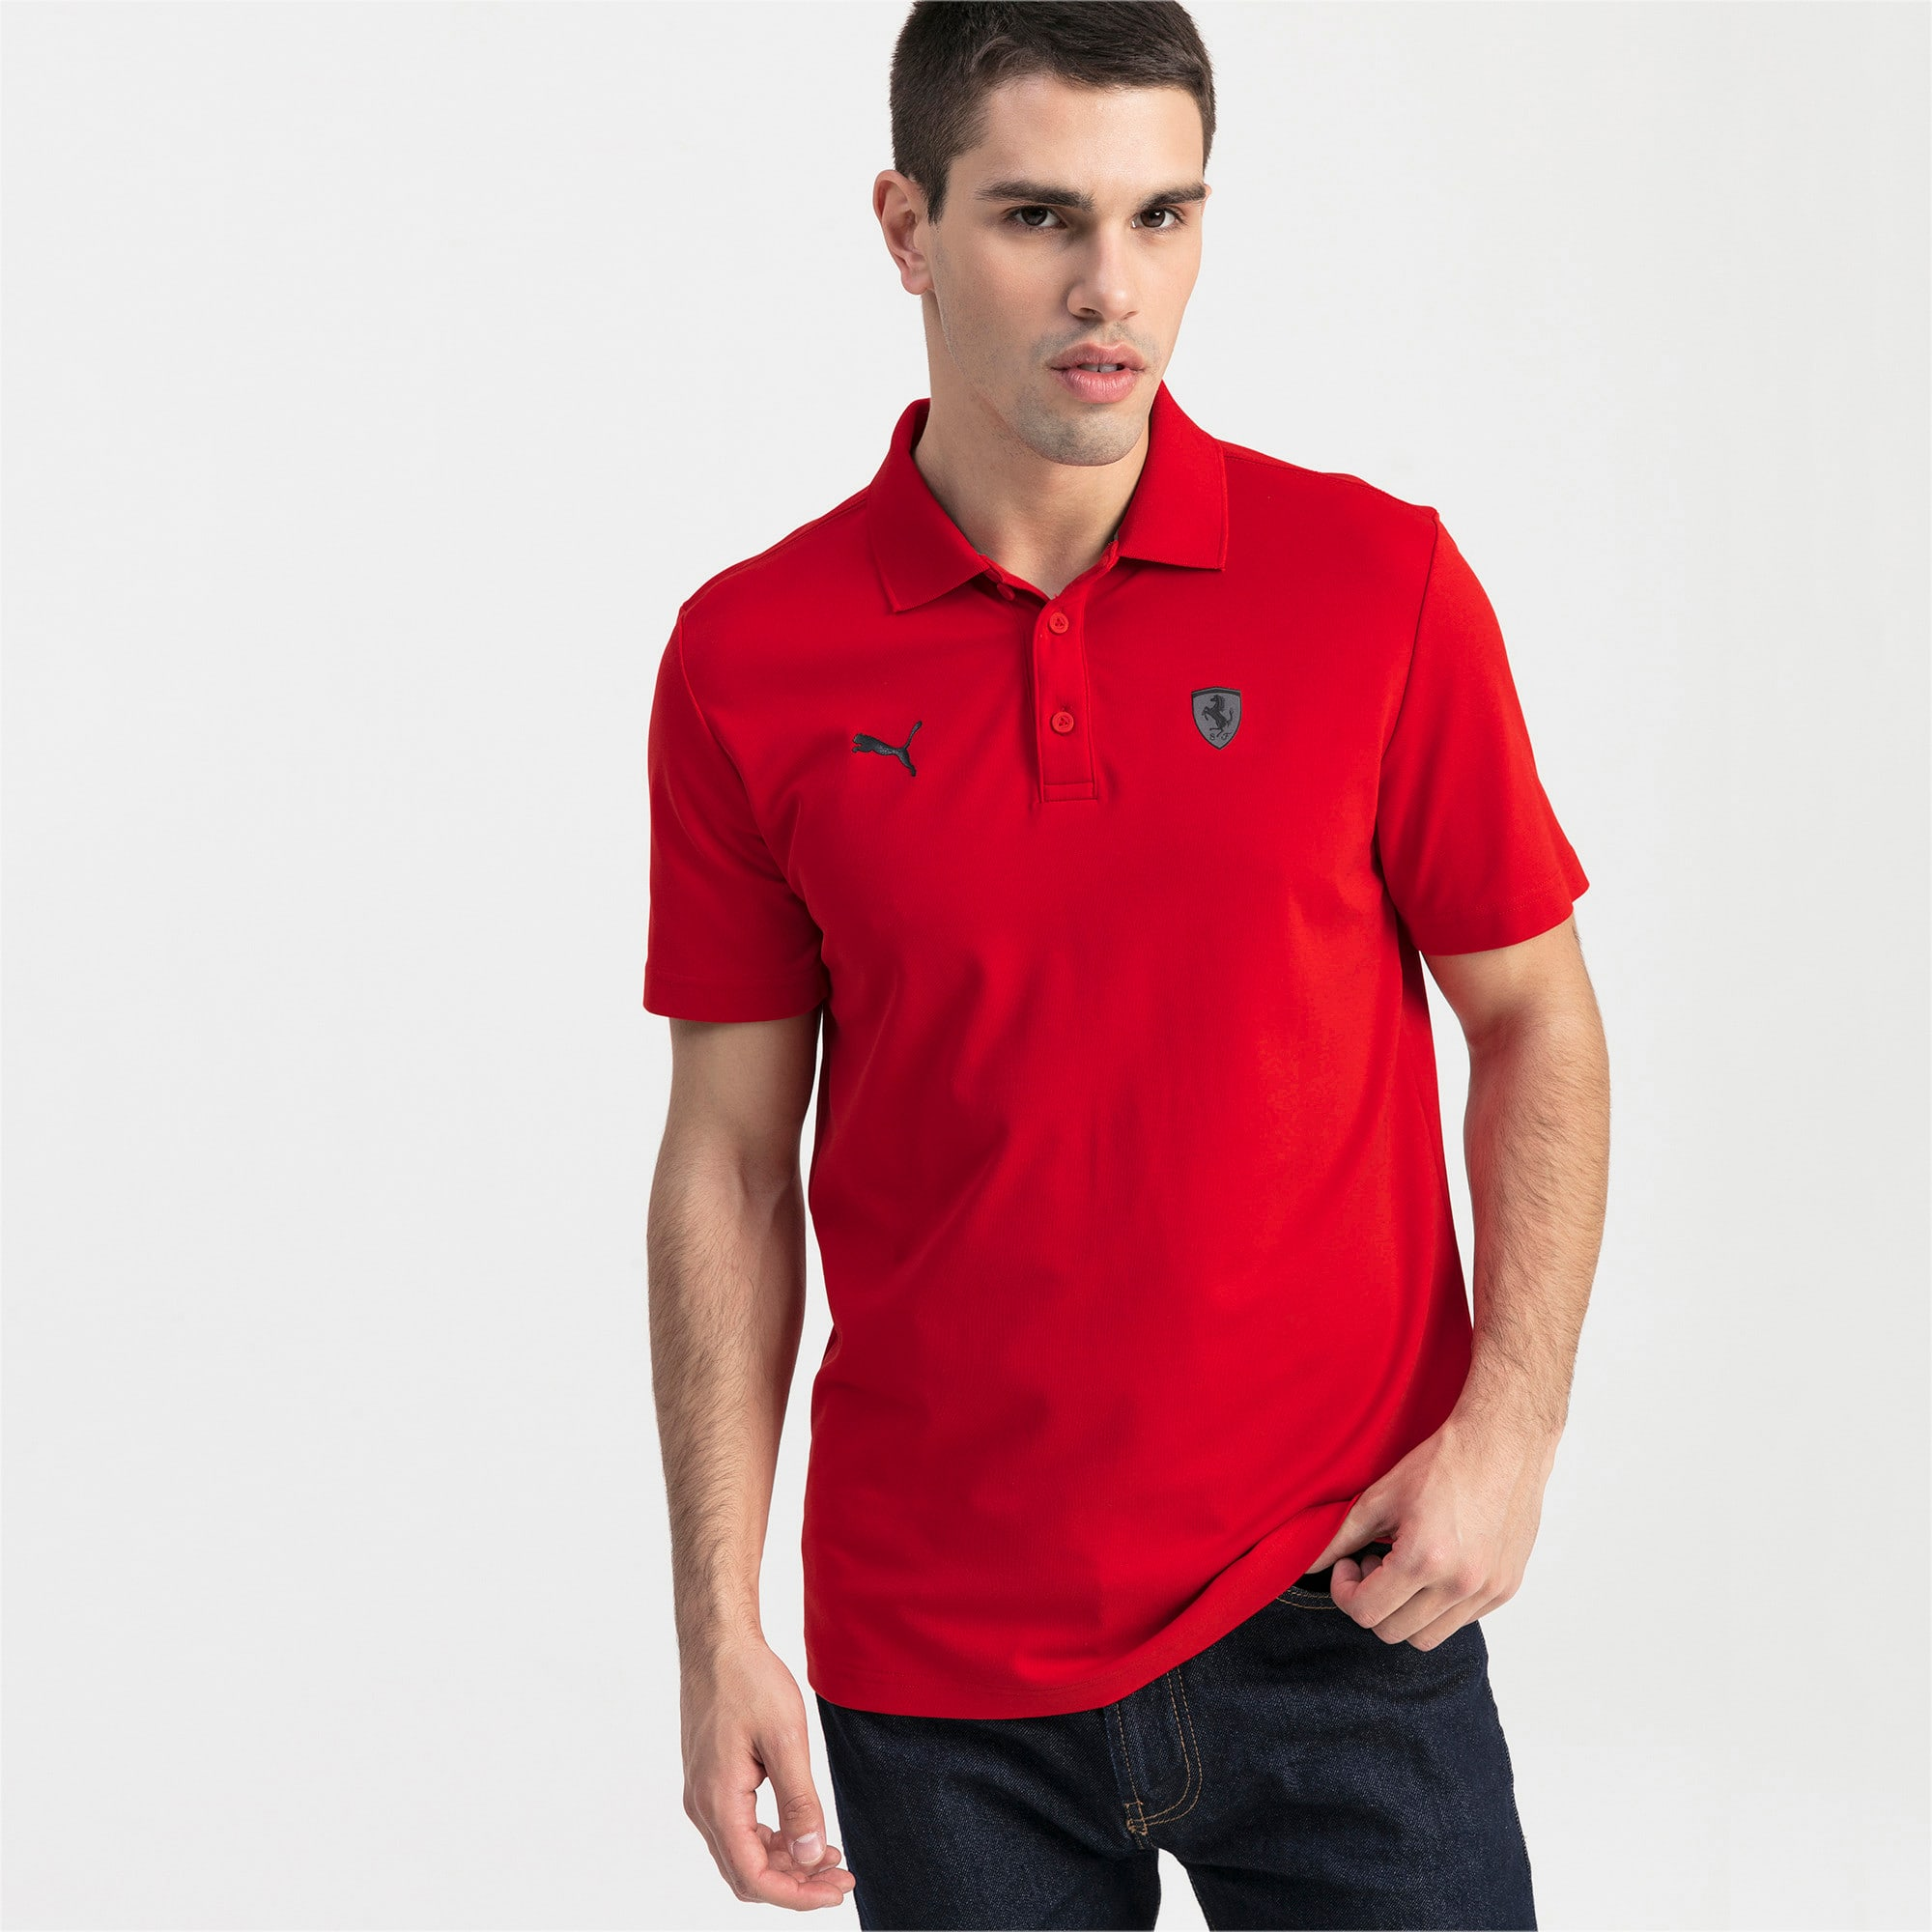 Thumbnail 1 of Ferrari Men's Polo Shirt, Rosso Corsa, medium